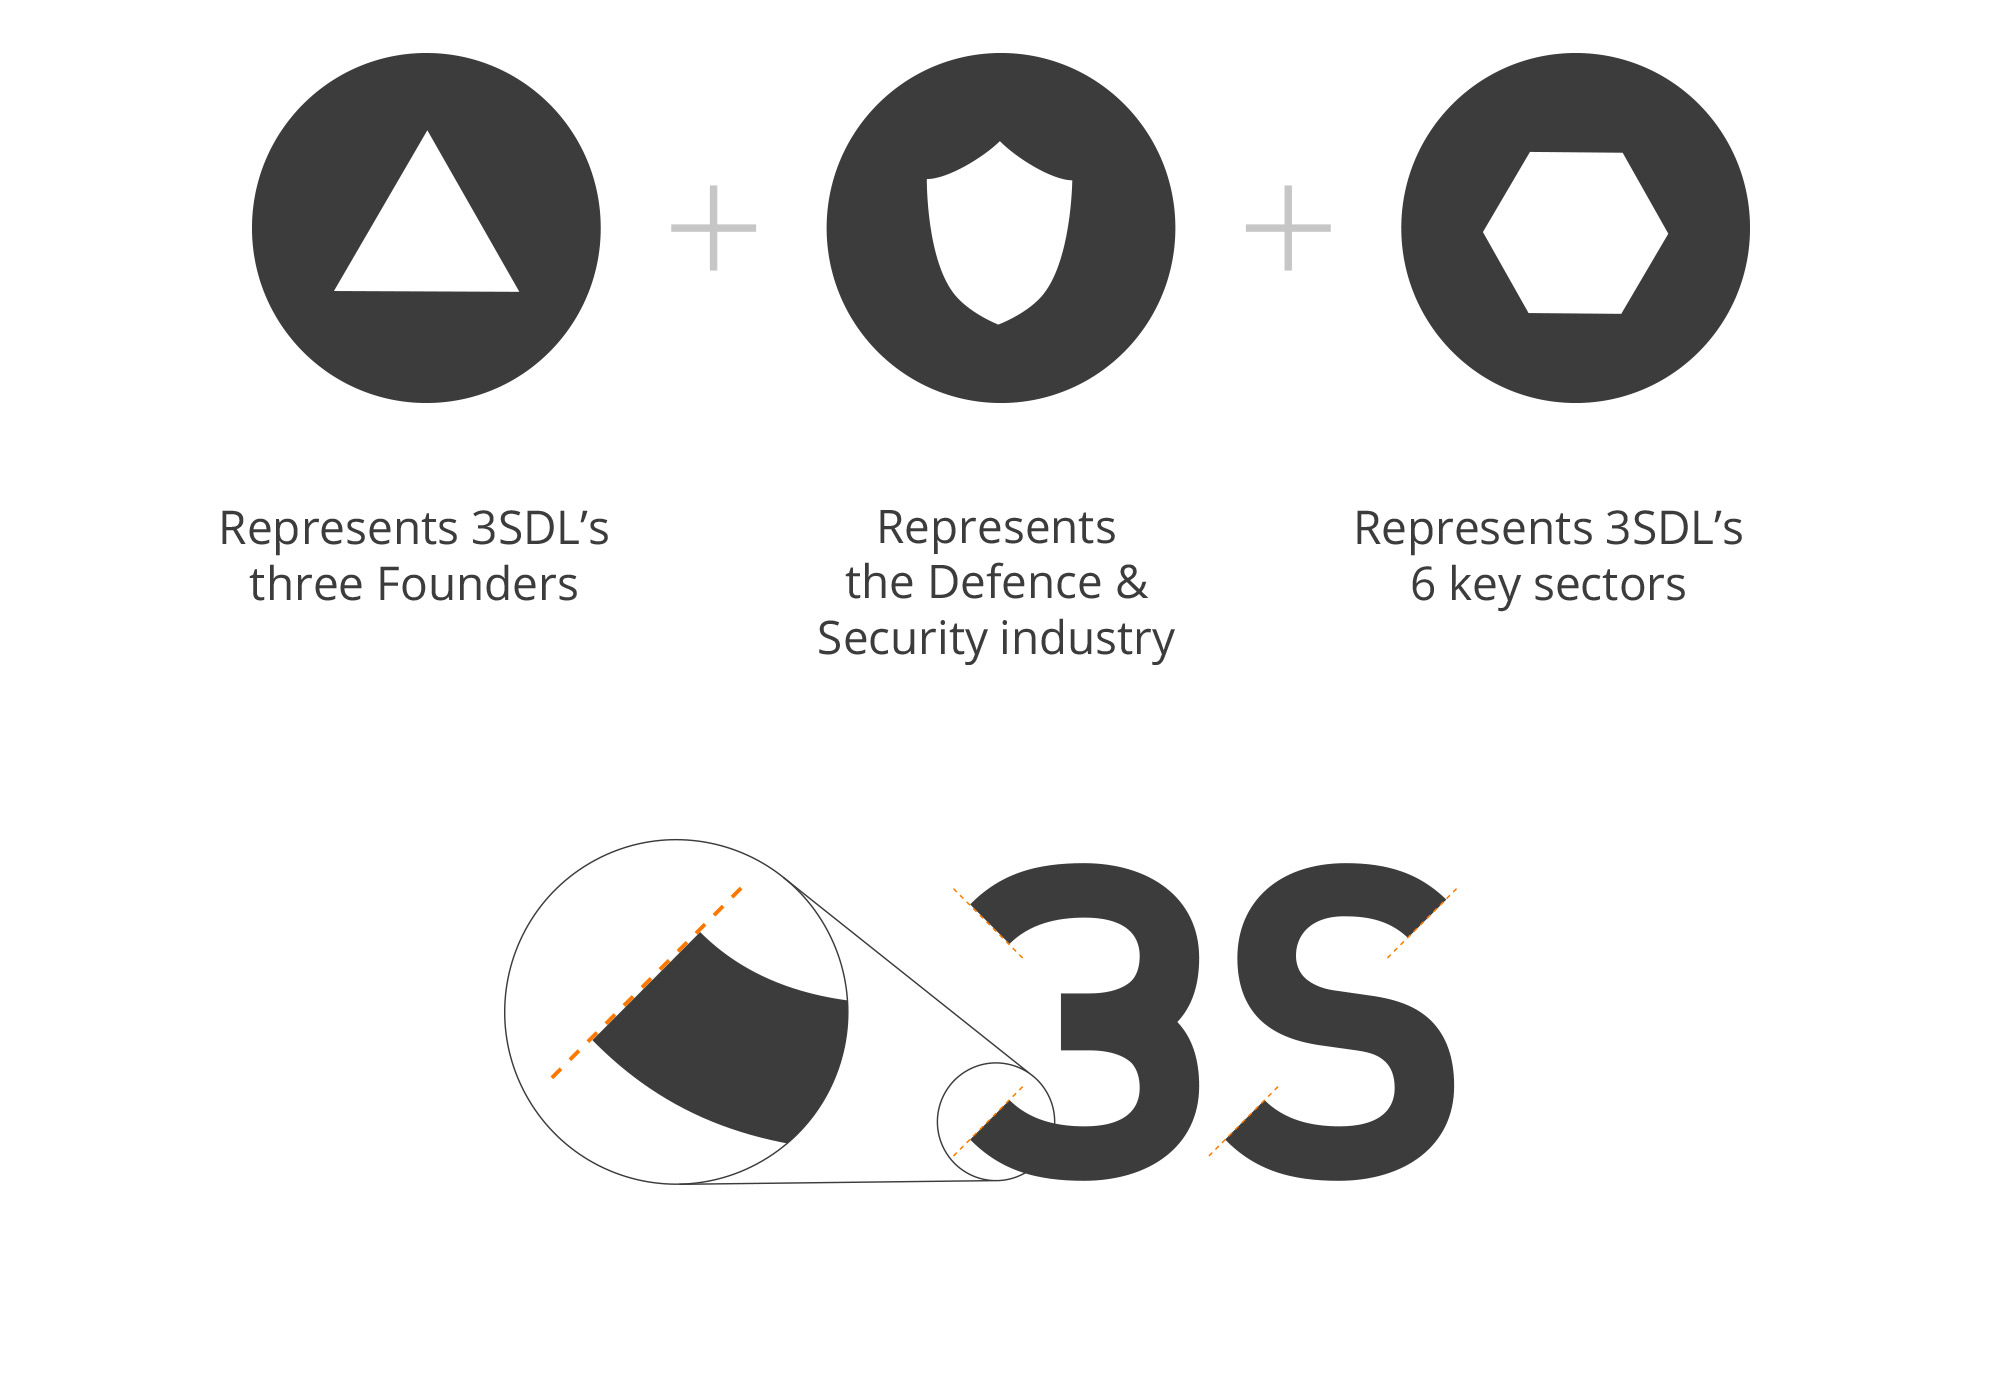 how the 3SDL logo was created